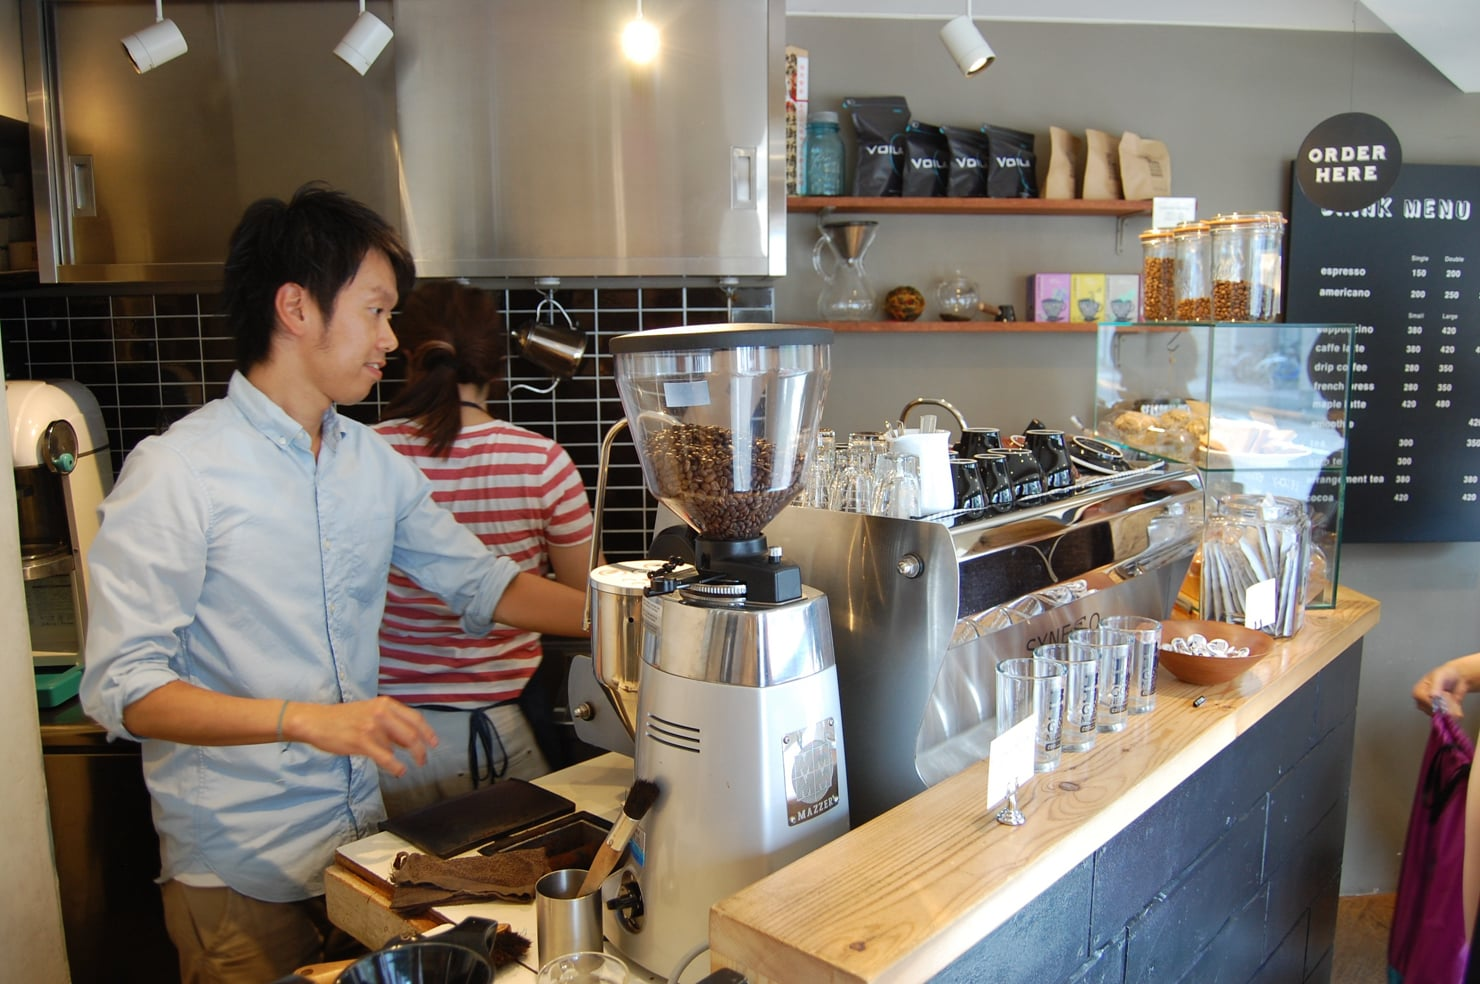 Be A Good Nieghbor Coffee Kiosk, Skytree (source: sprudge.com)